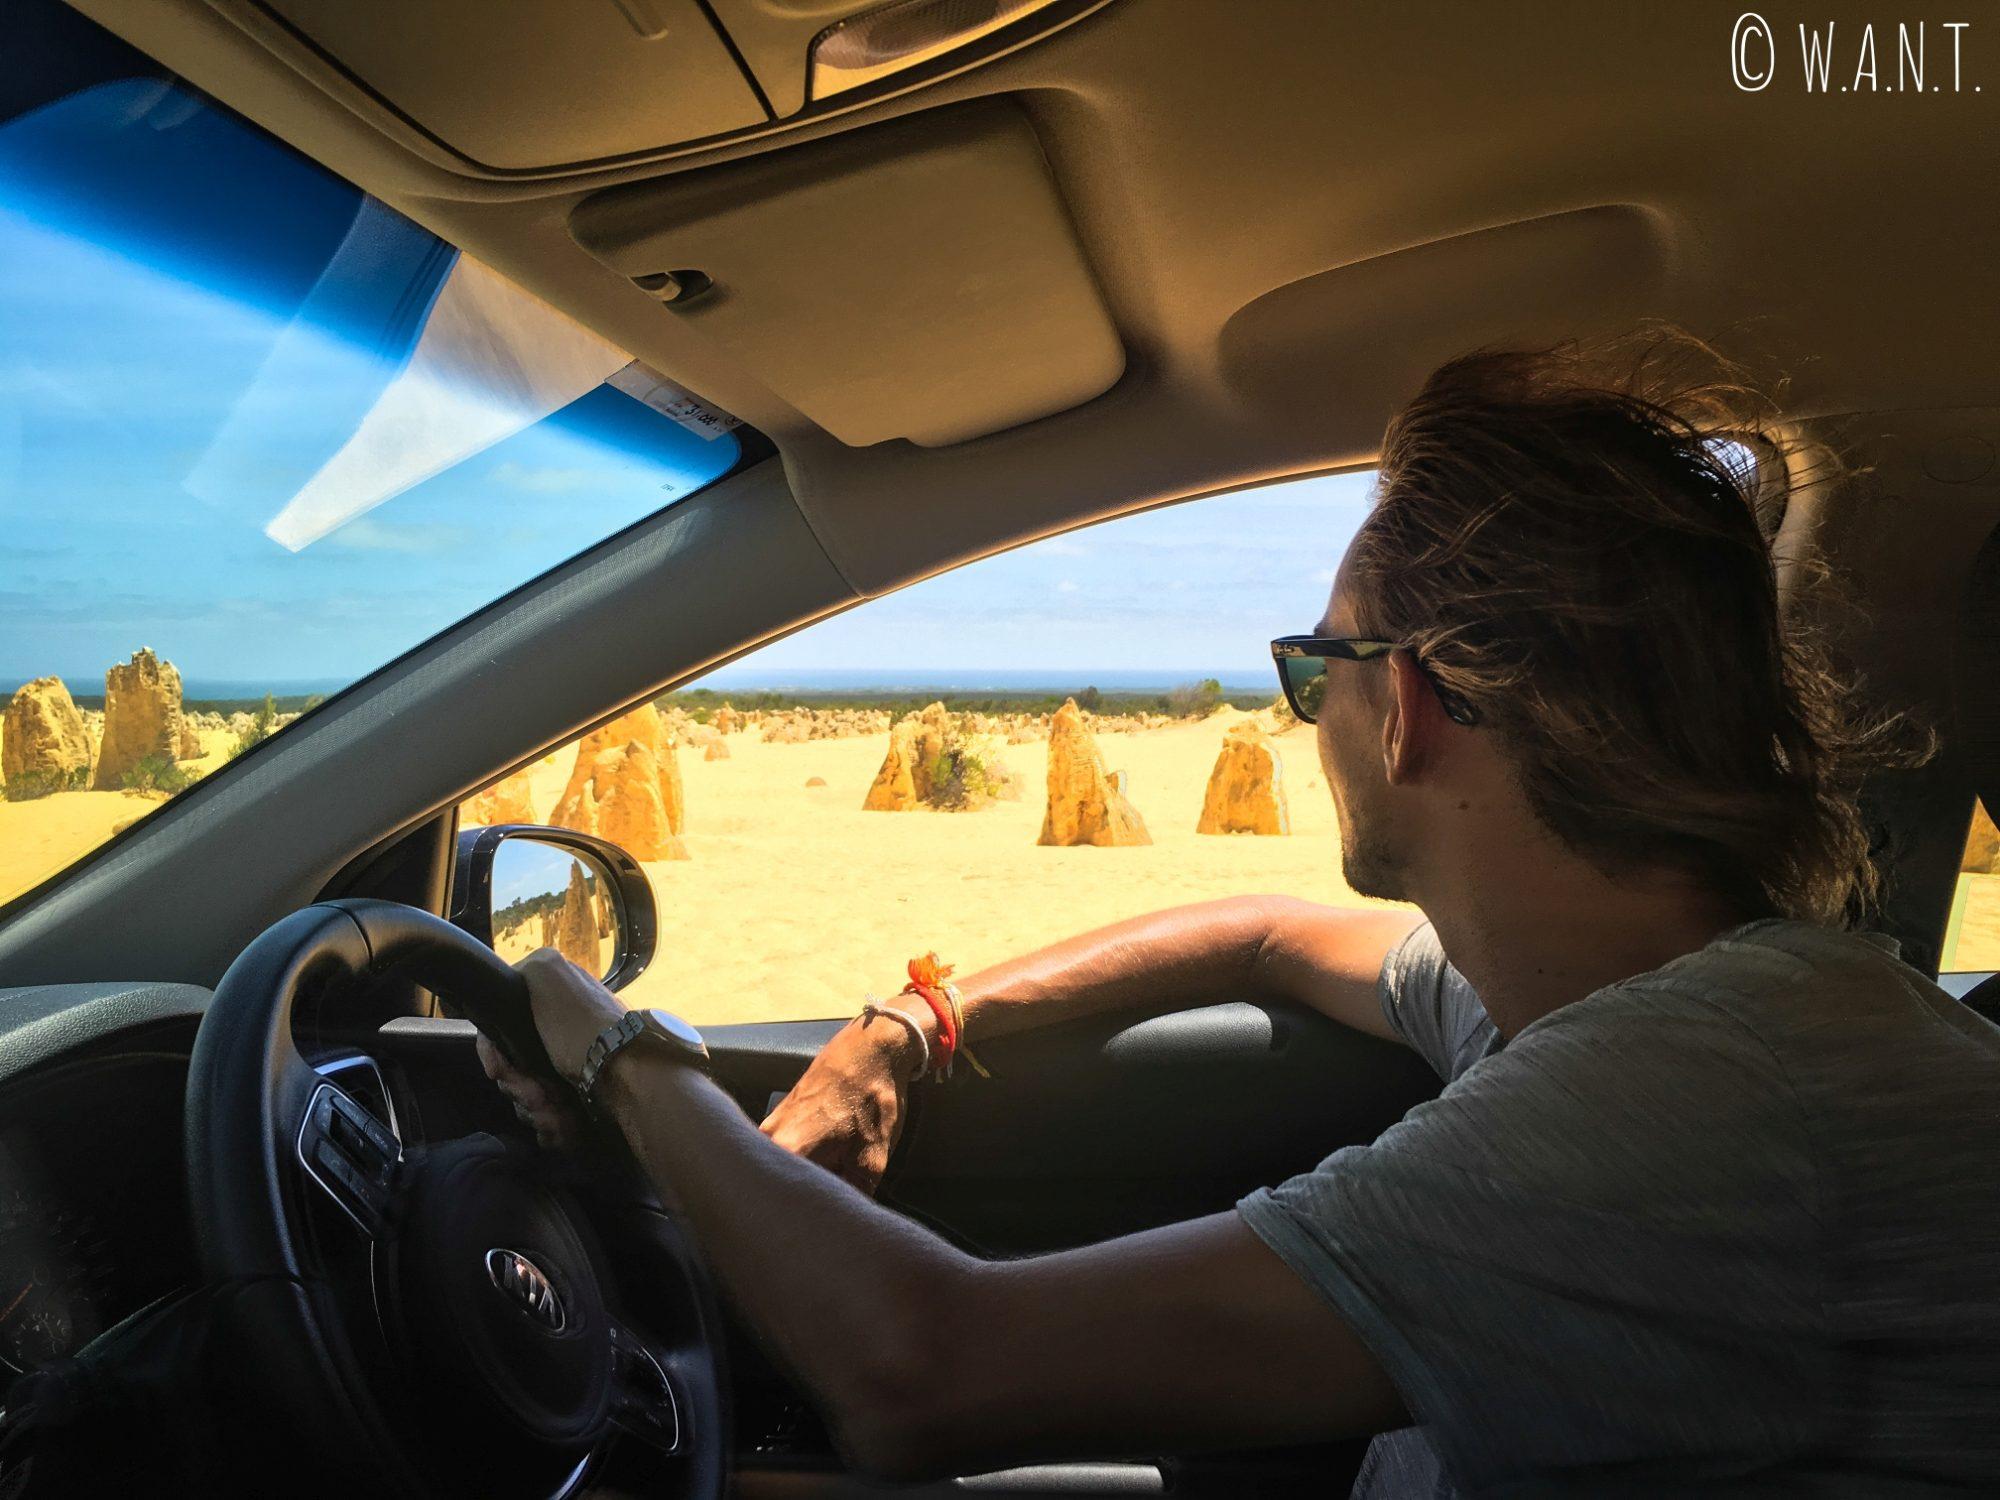 Benjamin dans notre voiture, admirant les Pinnacles près de Cervantes